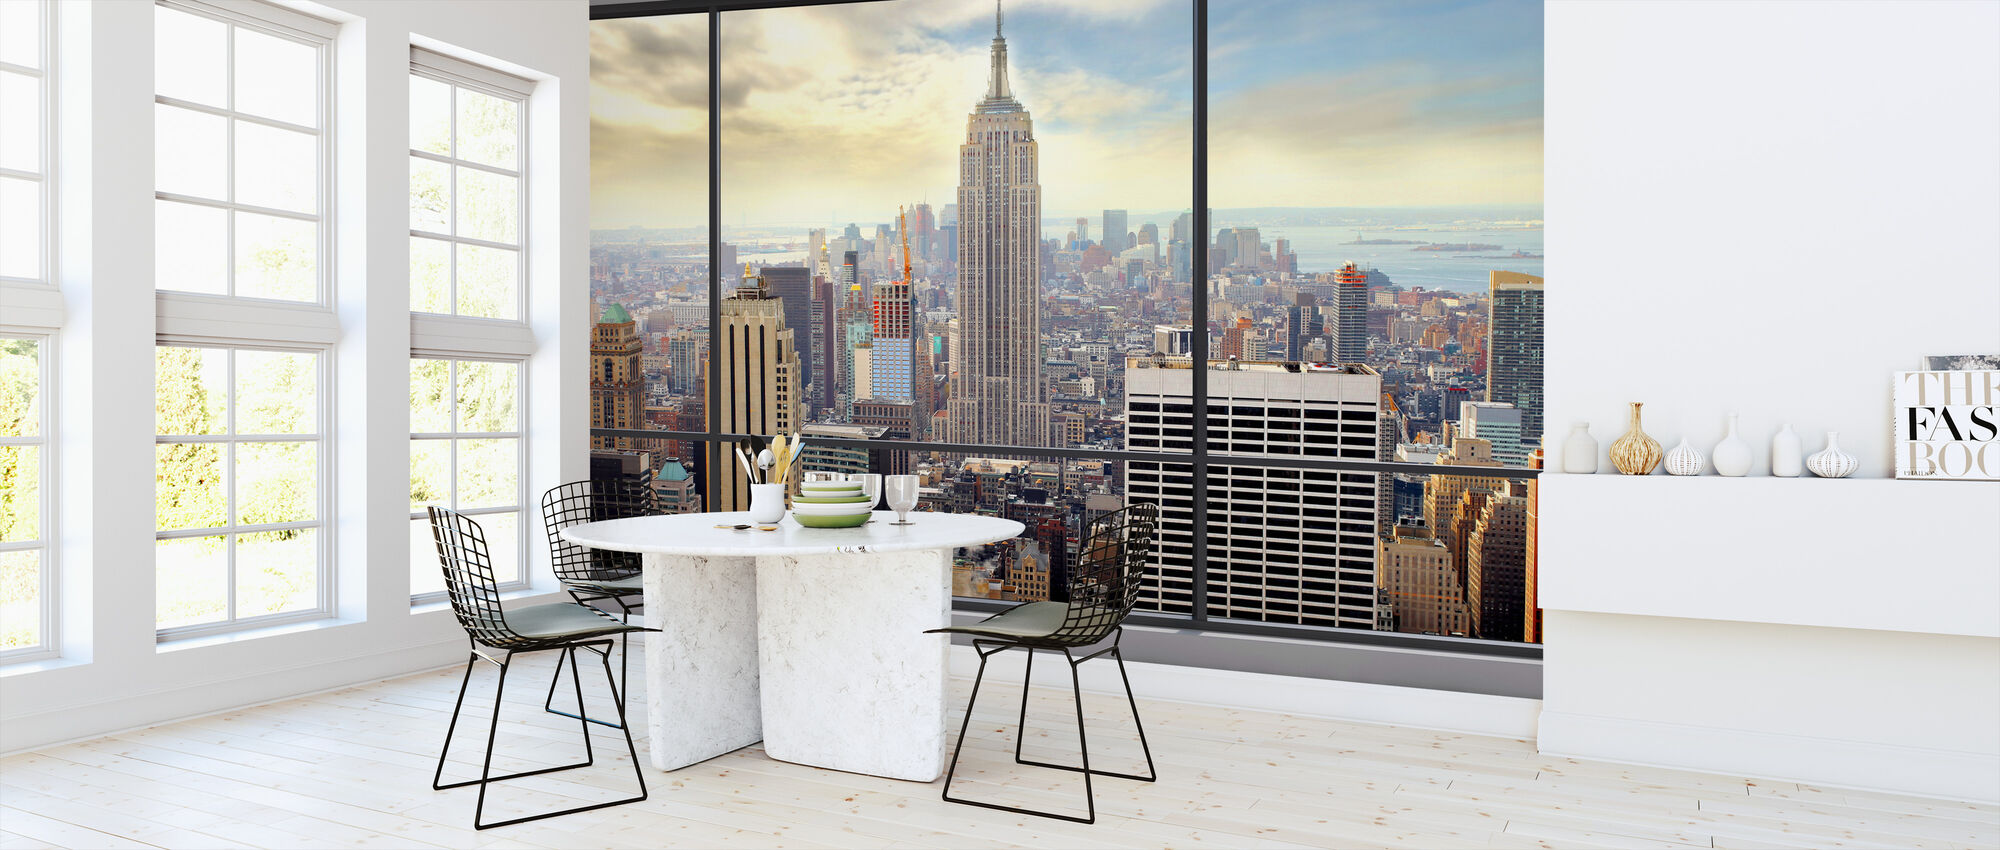 Penthouse Window View - Wallpaper - Kitchen